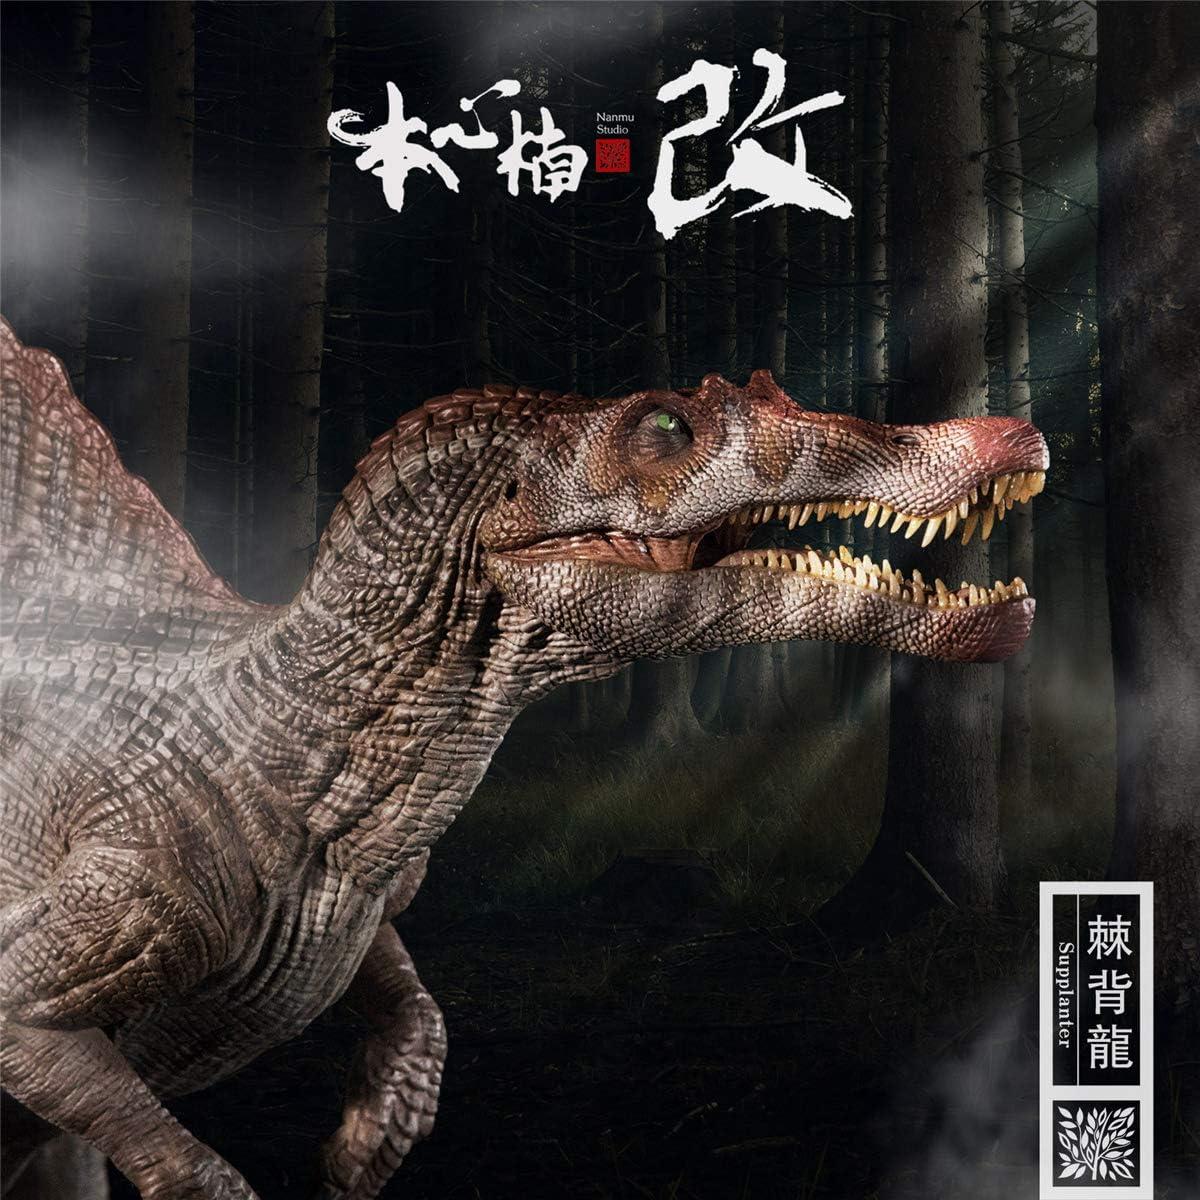 ITOY Jurassic World 2 1//35 Dino Velociraptor Baby Blue Dinosaur Statue Model New